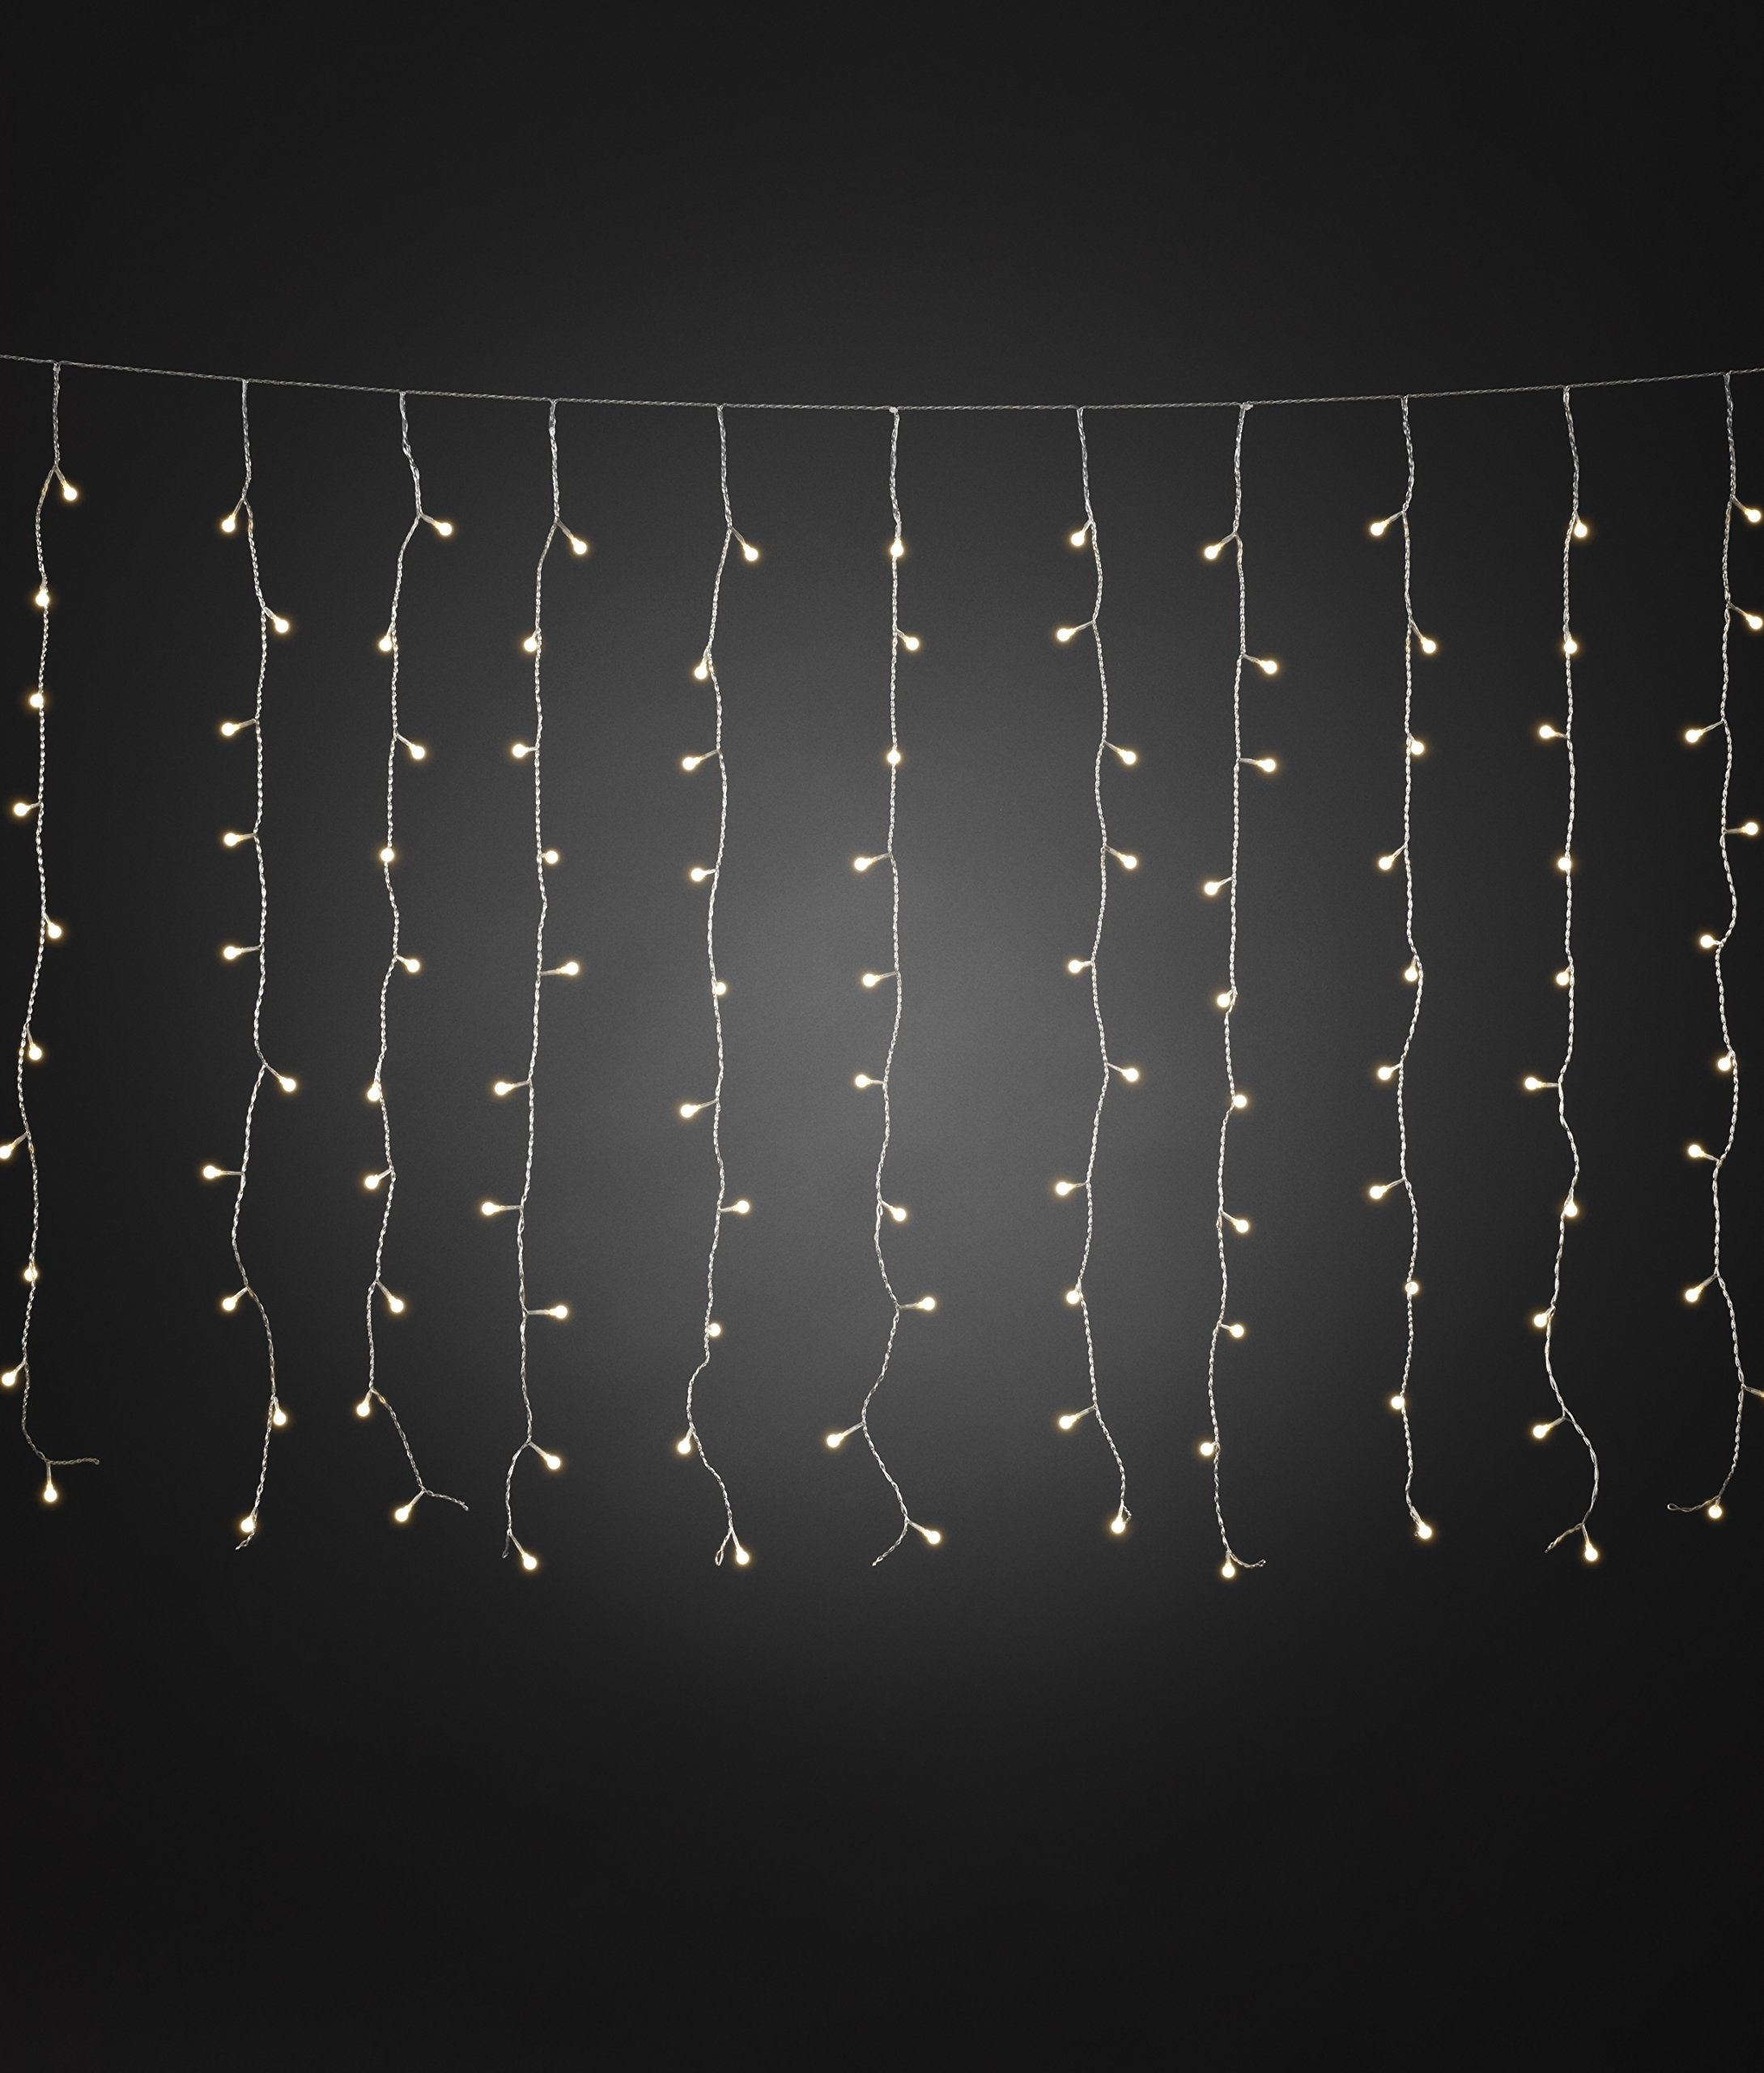 Konstsmide-3675-103-LED-Eisregen-Lichtervorhang-mit-weien-Globes-fr-Auen-IP44-24V-Auentrafo-400-warm-weie-Dioden-transparentes-Kabel